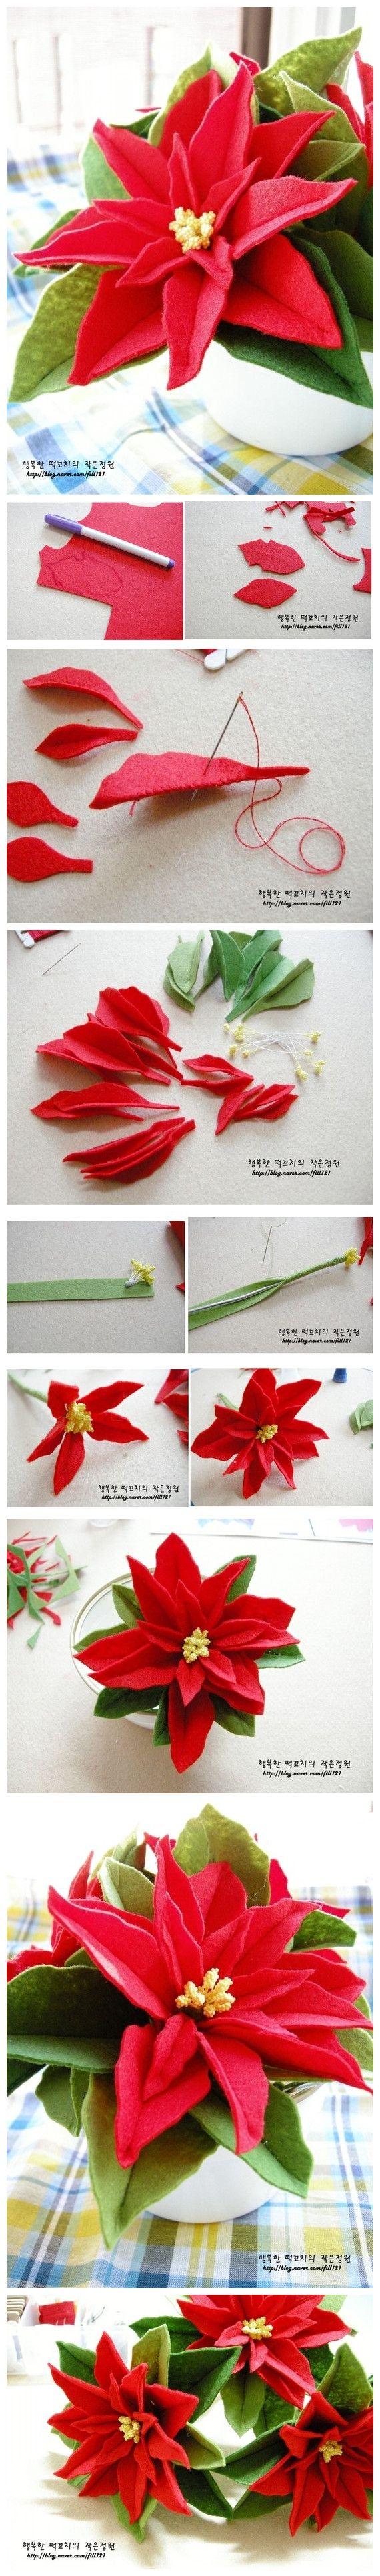 Flor de natal feltro